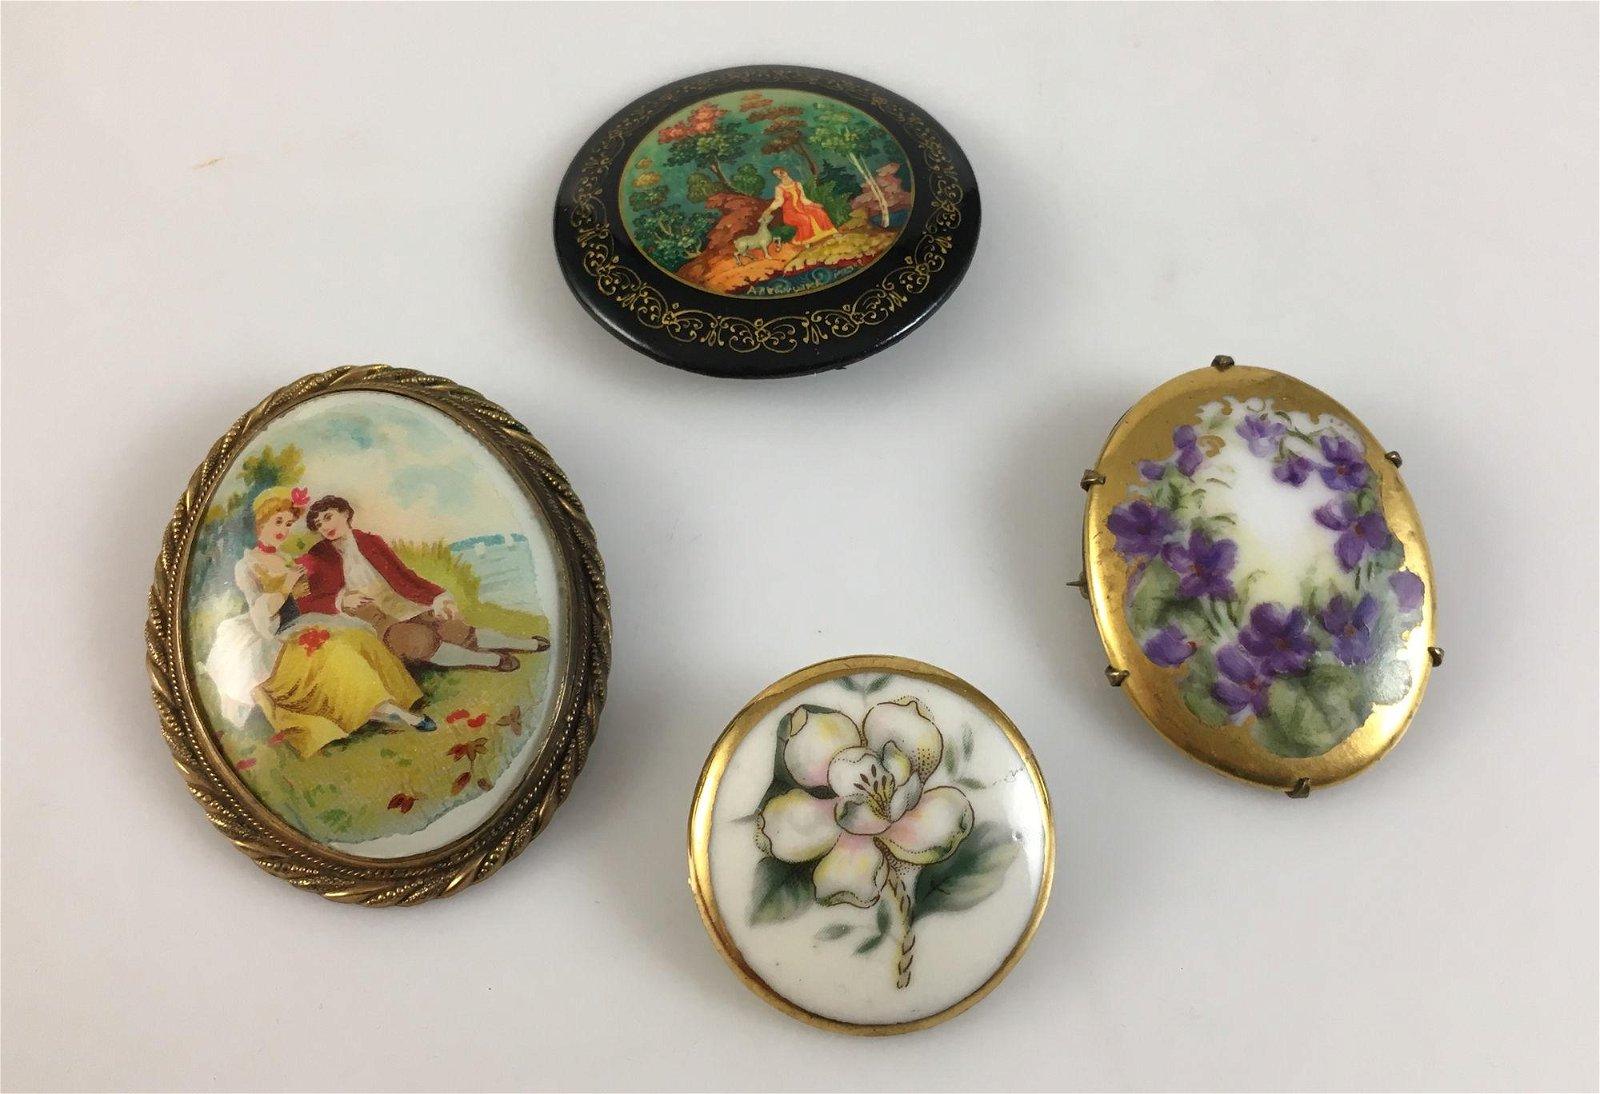 FOUR VINTAGE PINS